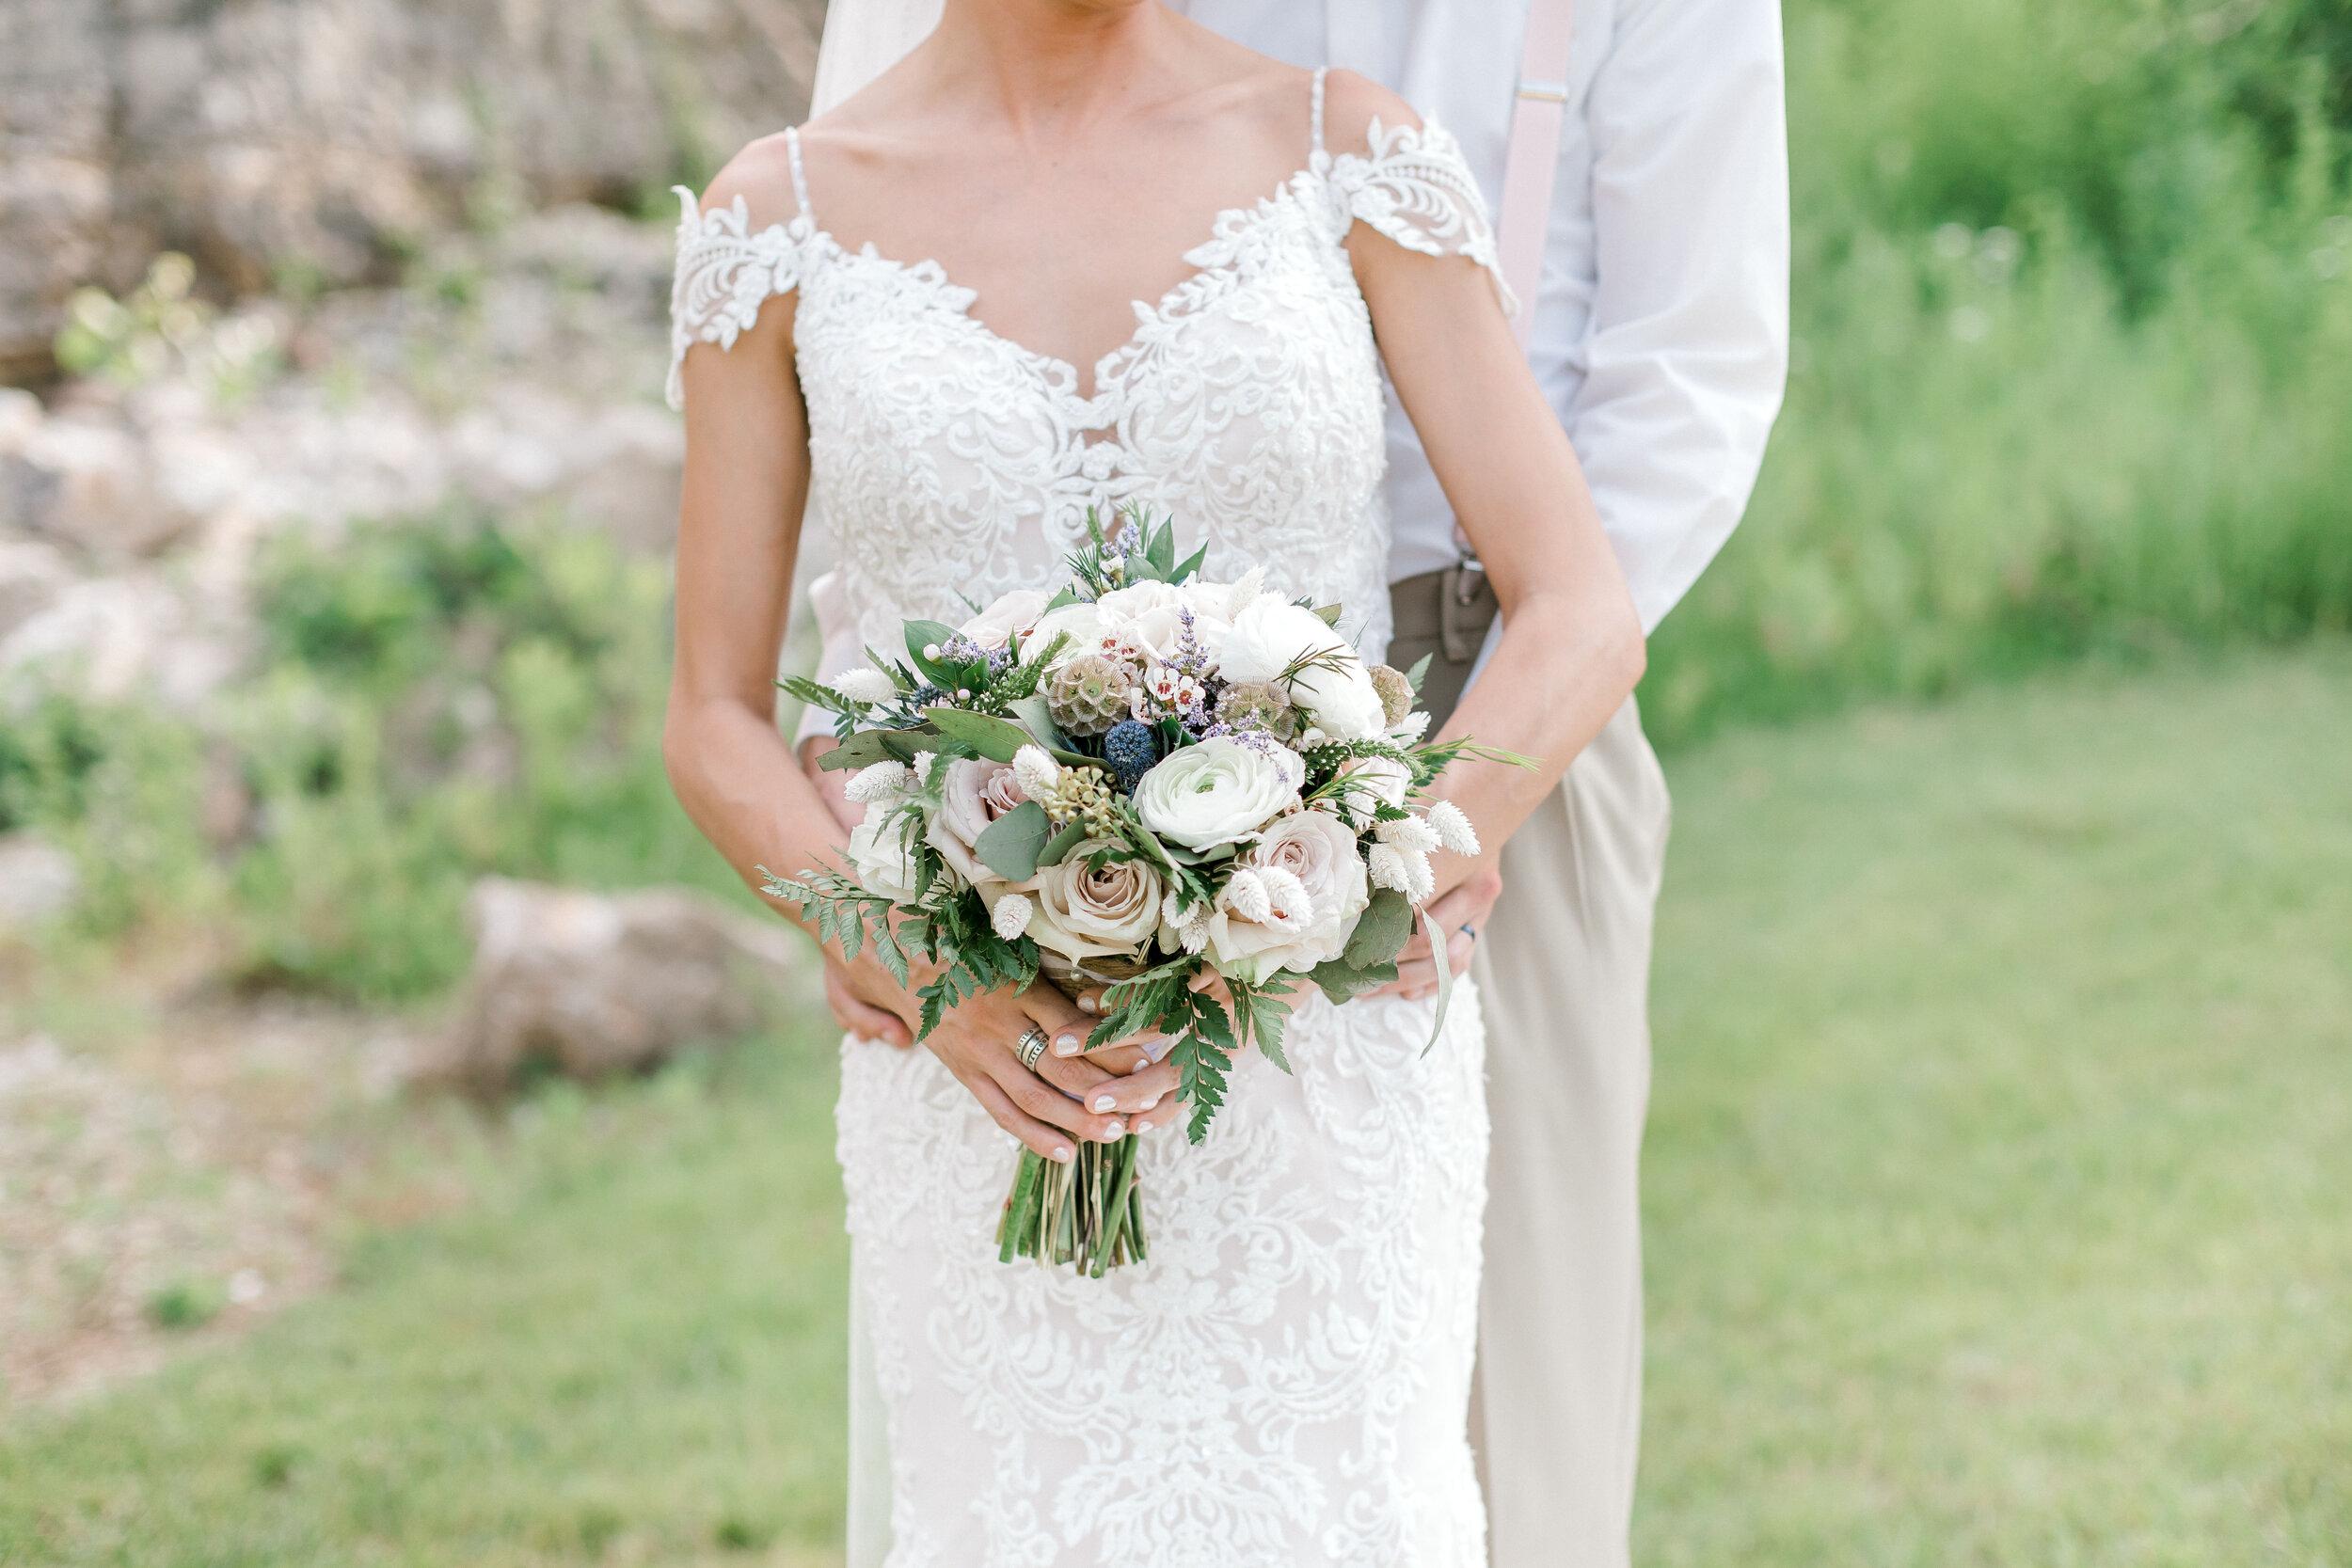 060119_Wedding_Brittany_Eddie_SS (338 of 354).jpg